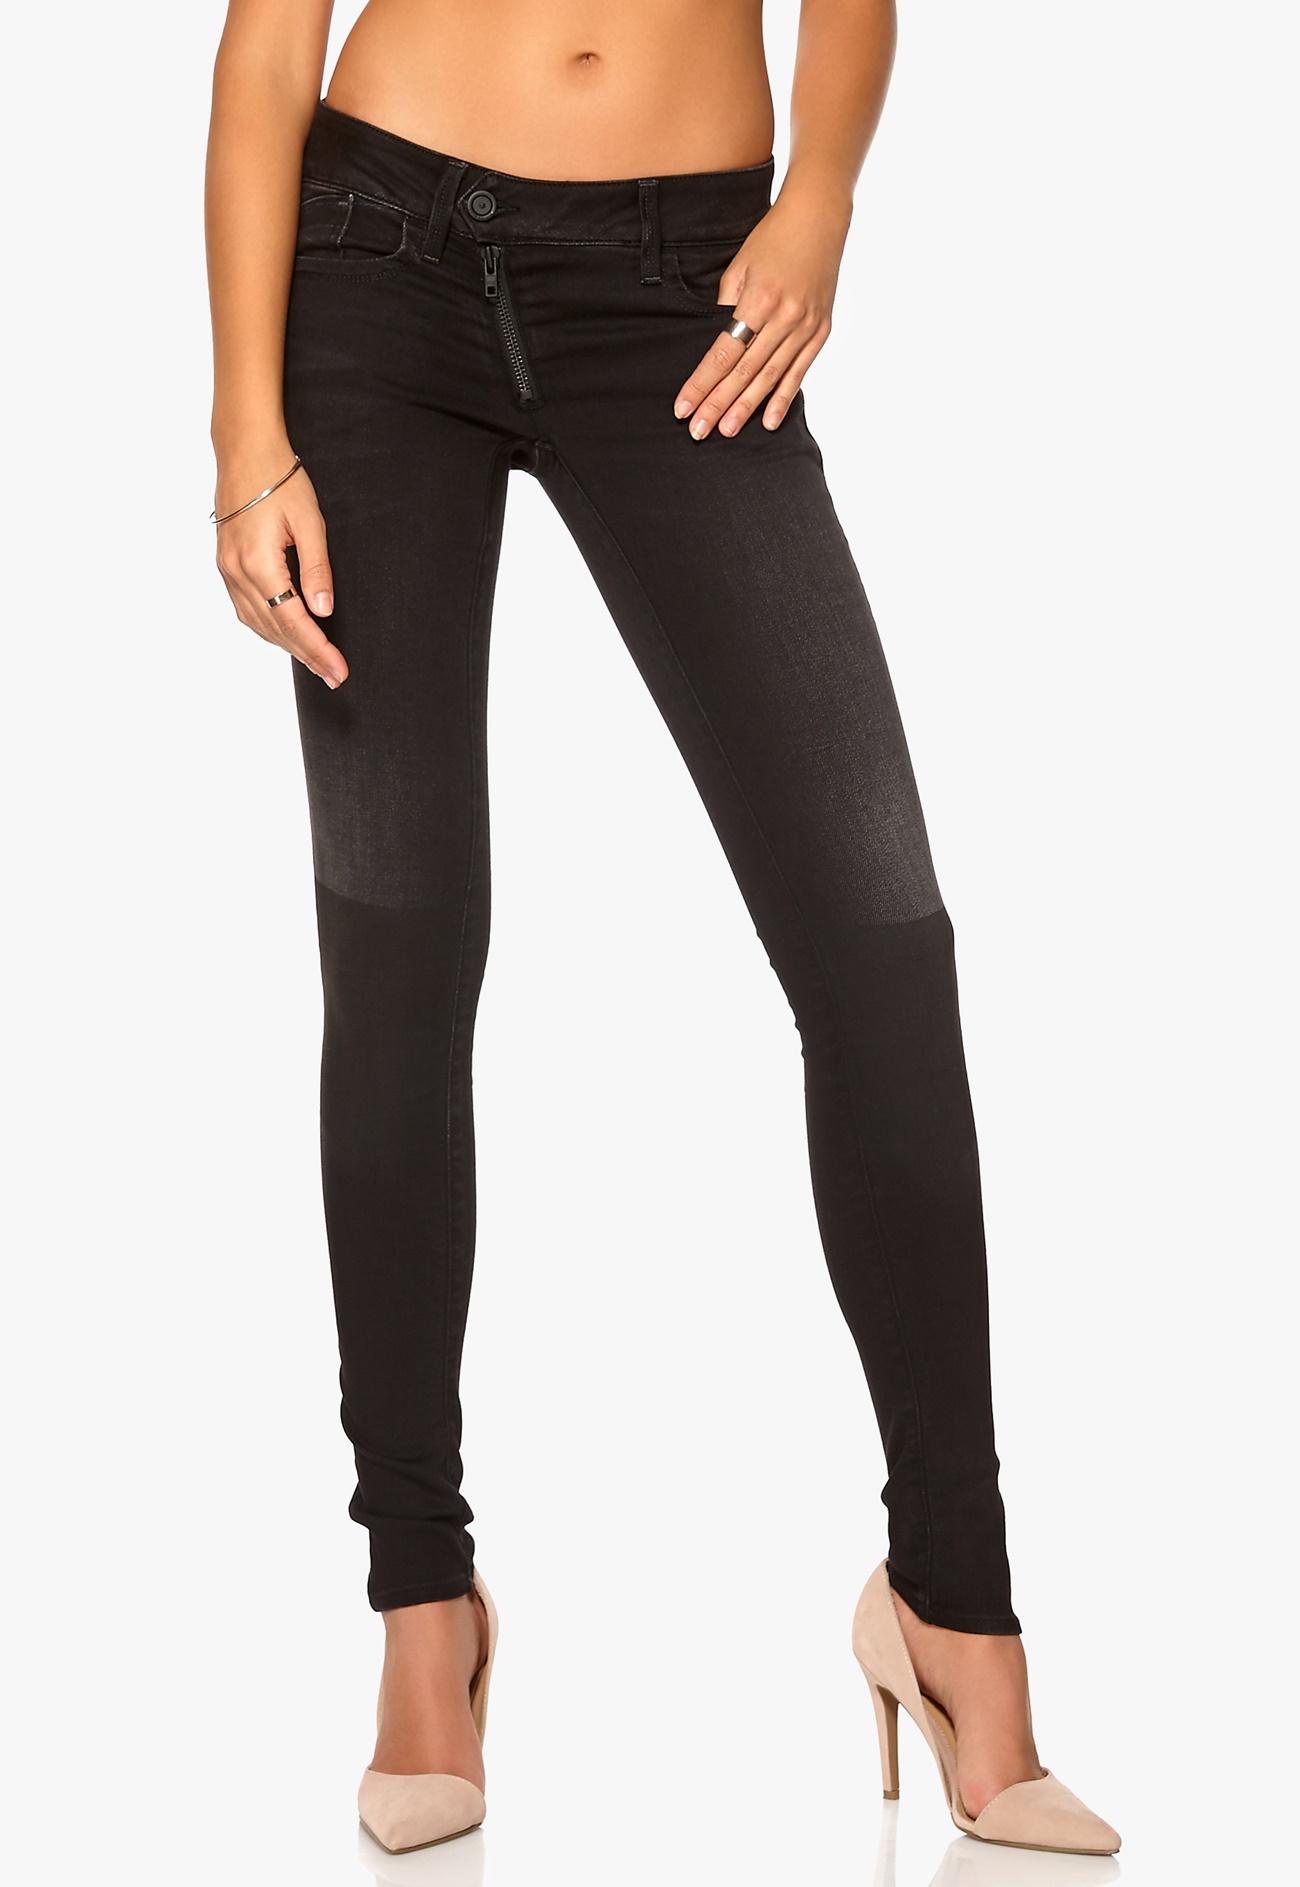 g star lynn zip skinny jeans 4840 shablon wash bubbleroom. Black Bedroom Furniture Sets. Home Design Ideas